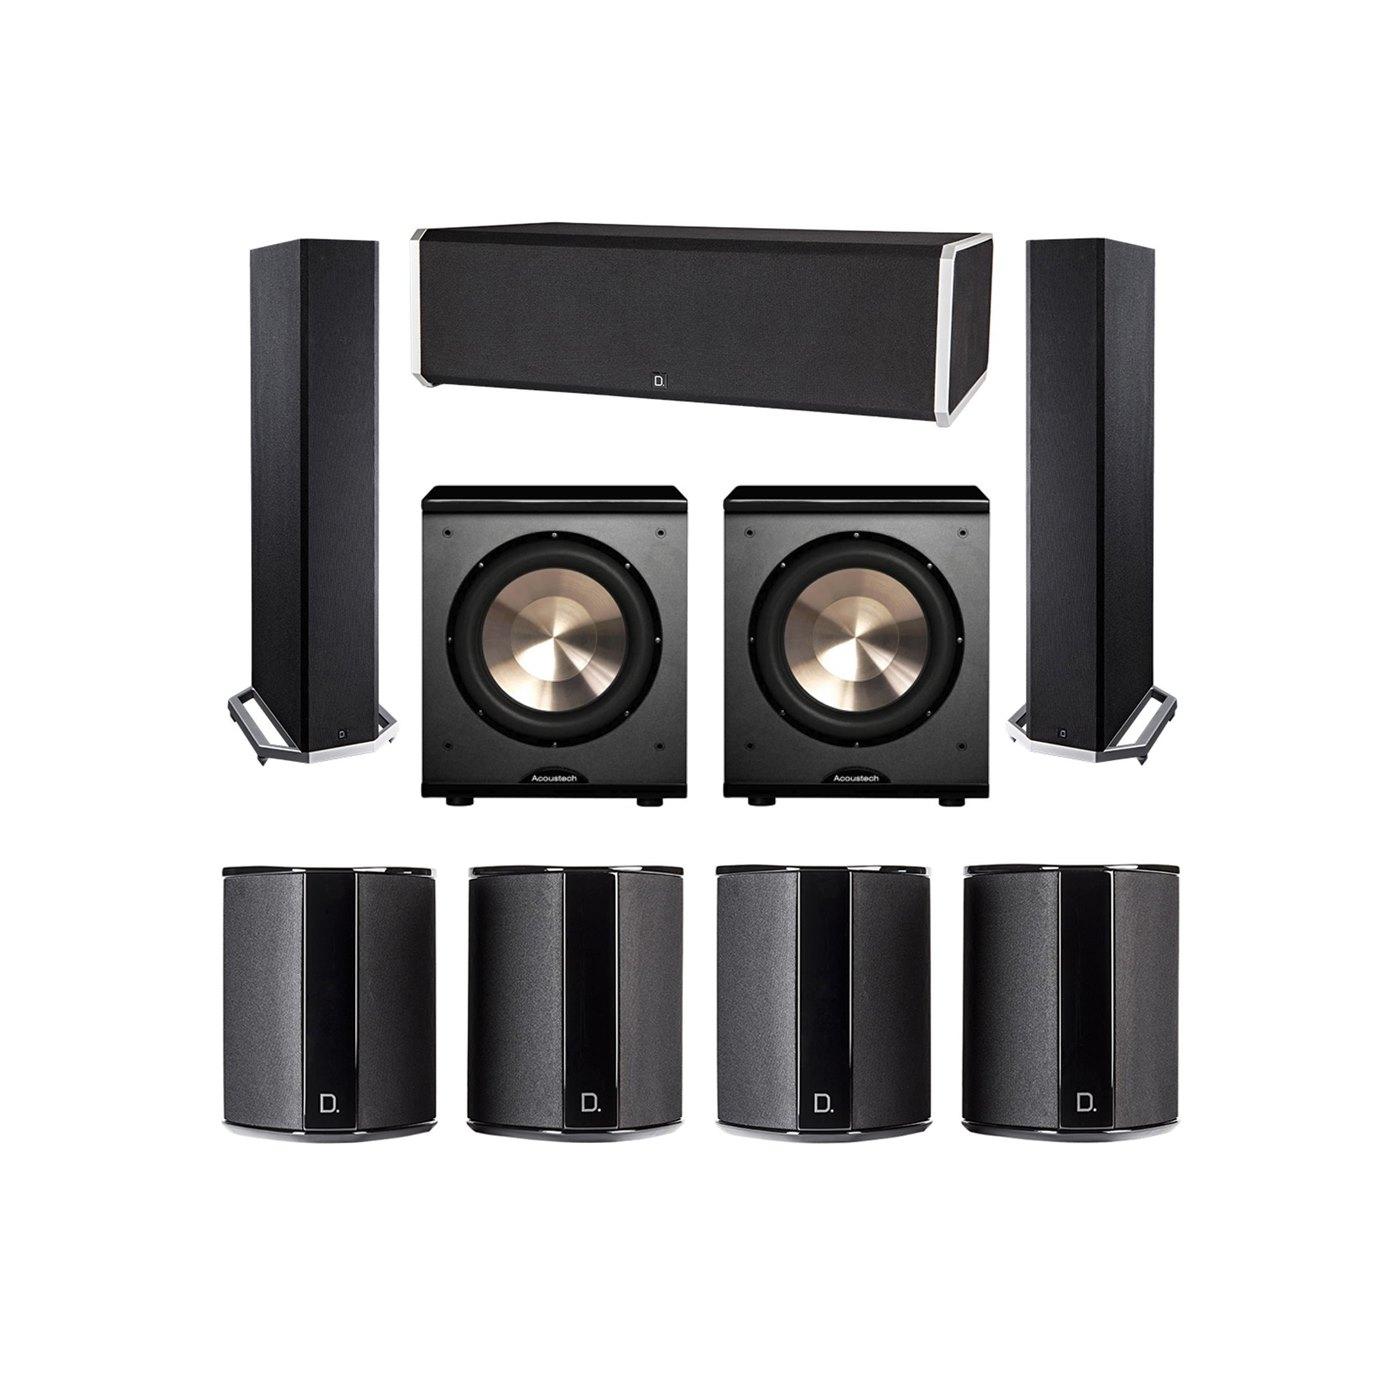 Definitive Technology 7.2 System with 2 BP9020 Tower Speakers, 1 CS9080 Center Channel Speaker, 4 SR9040 Surround Speaker, 2 BIC PL-200 Subwoofer